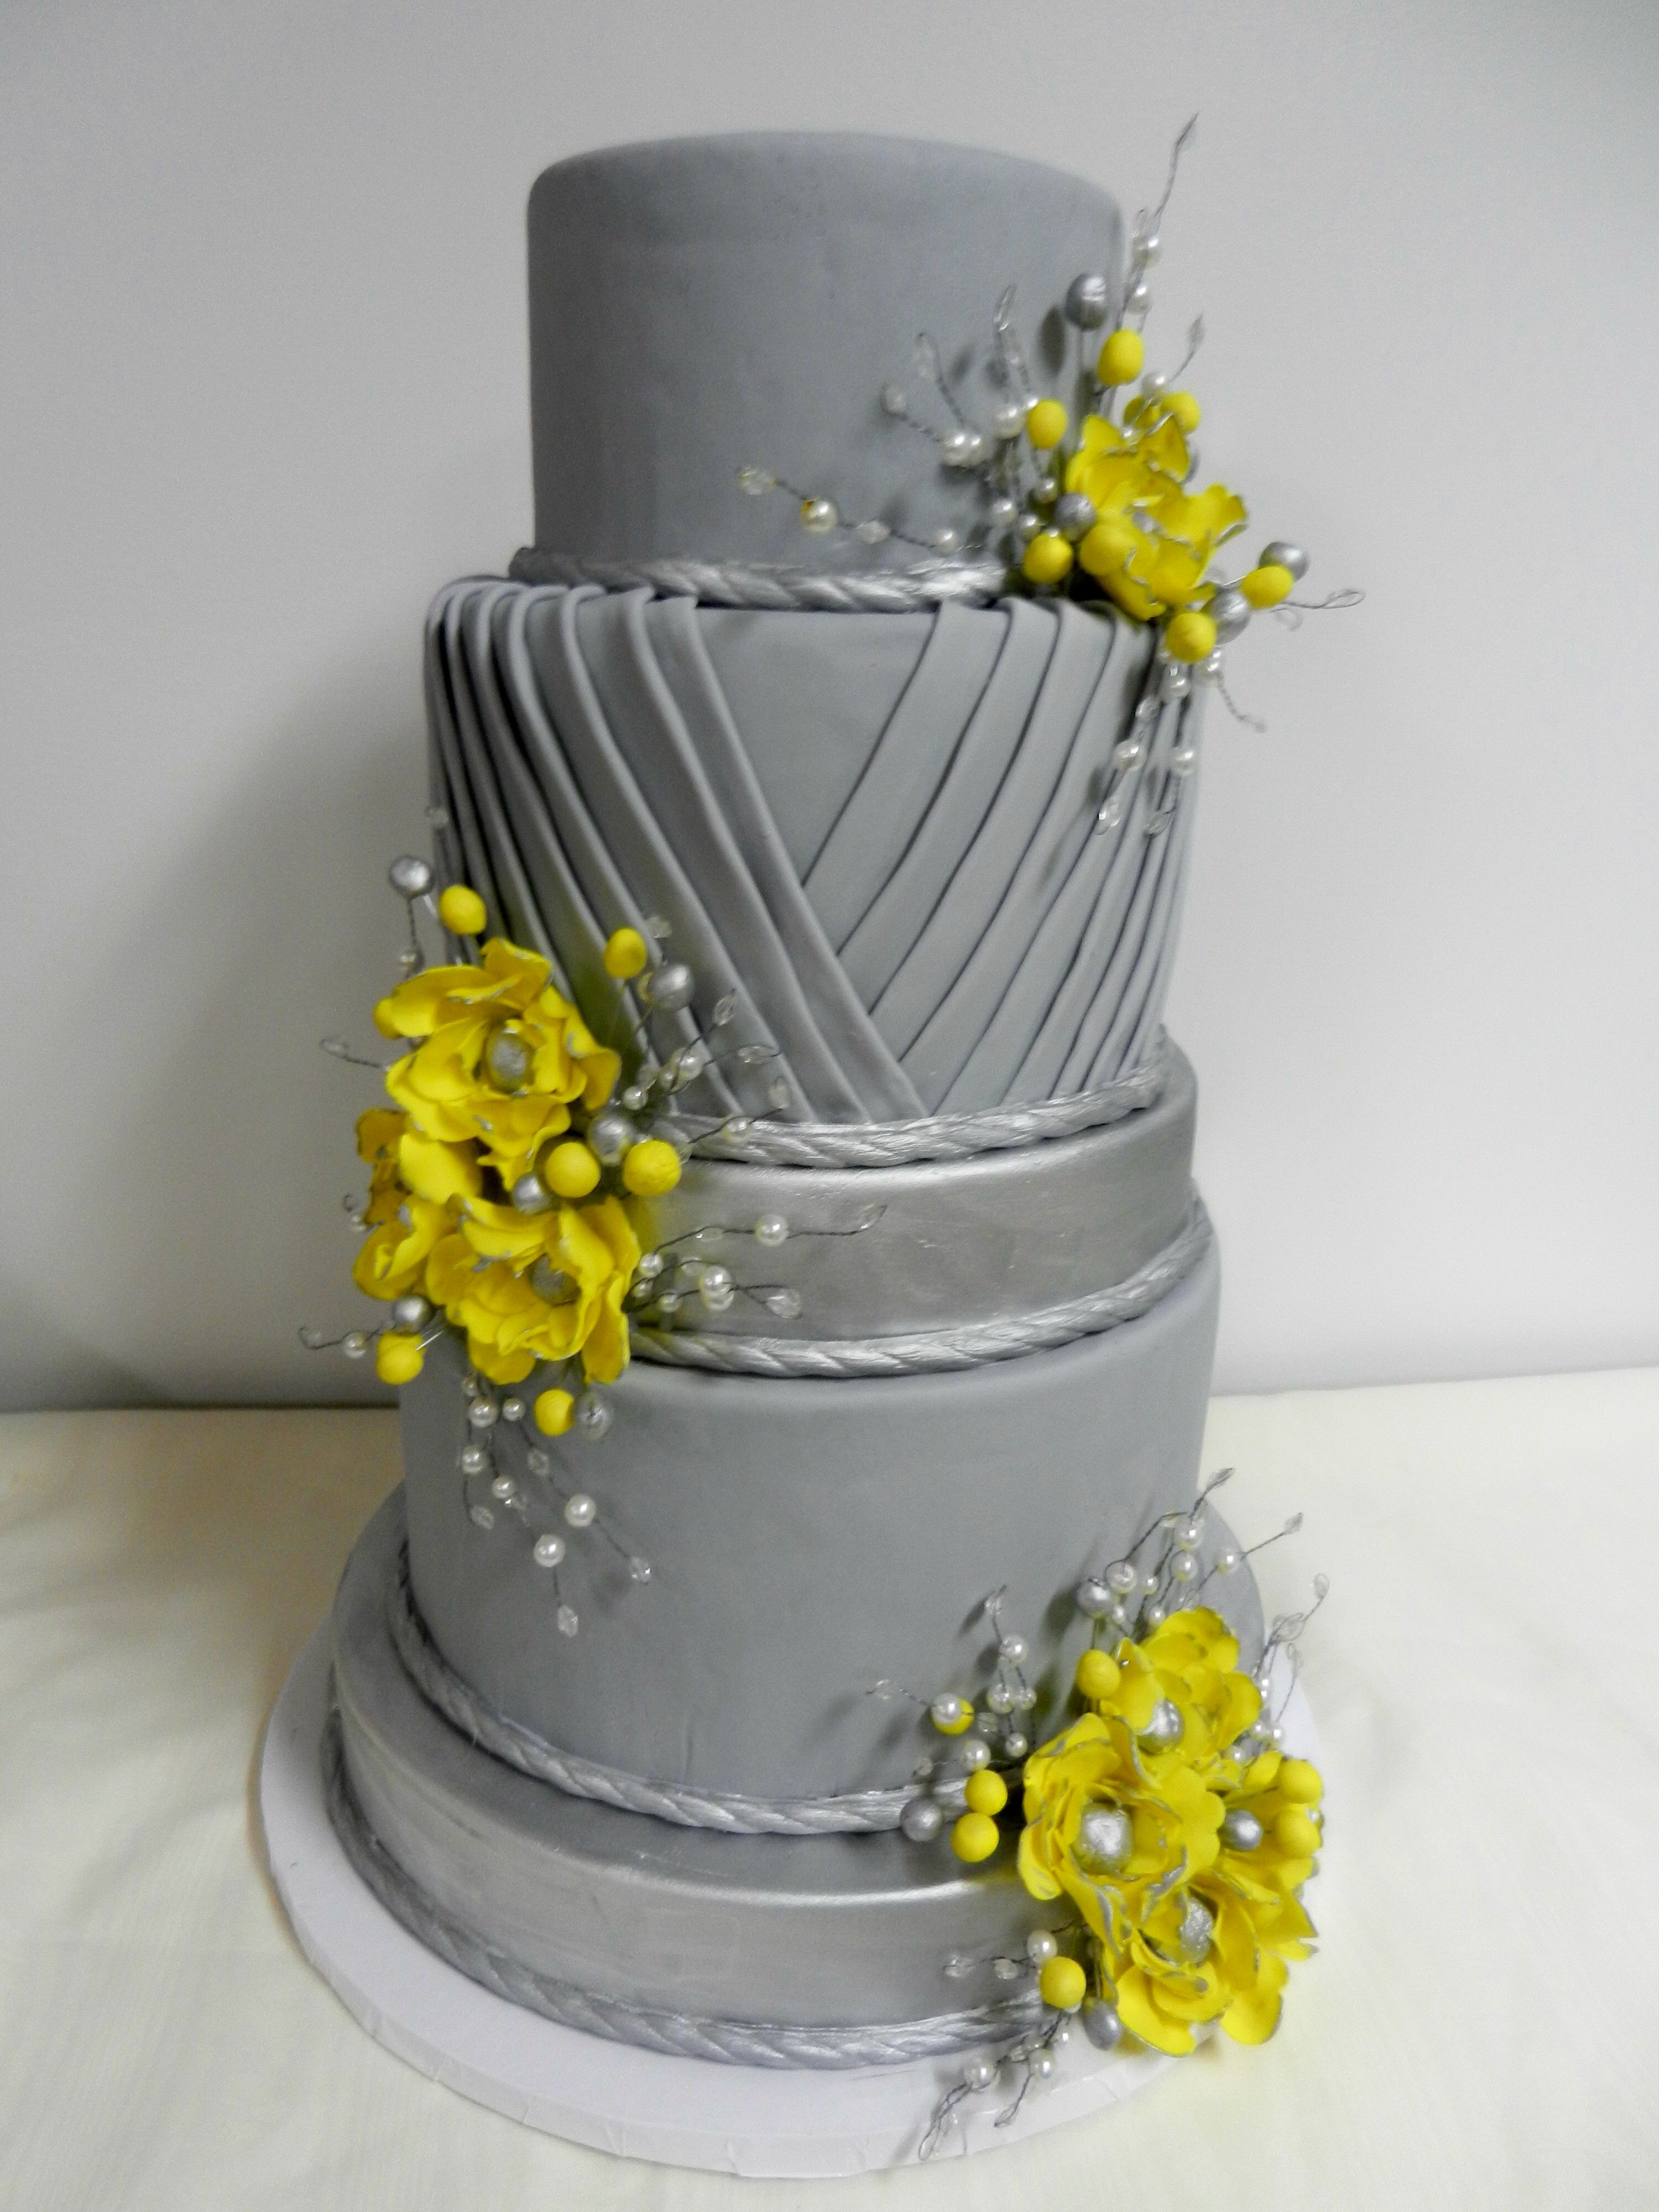 Gray And Yellow Pleated Wedding Cake Www.cheesecakeetc.biz Wedding Cakes  Charlotte NC